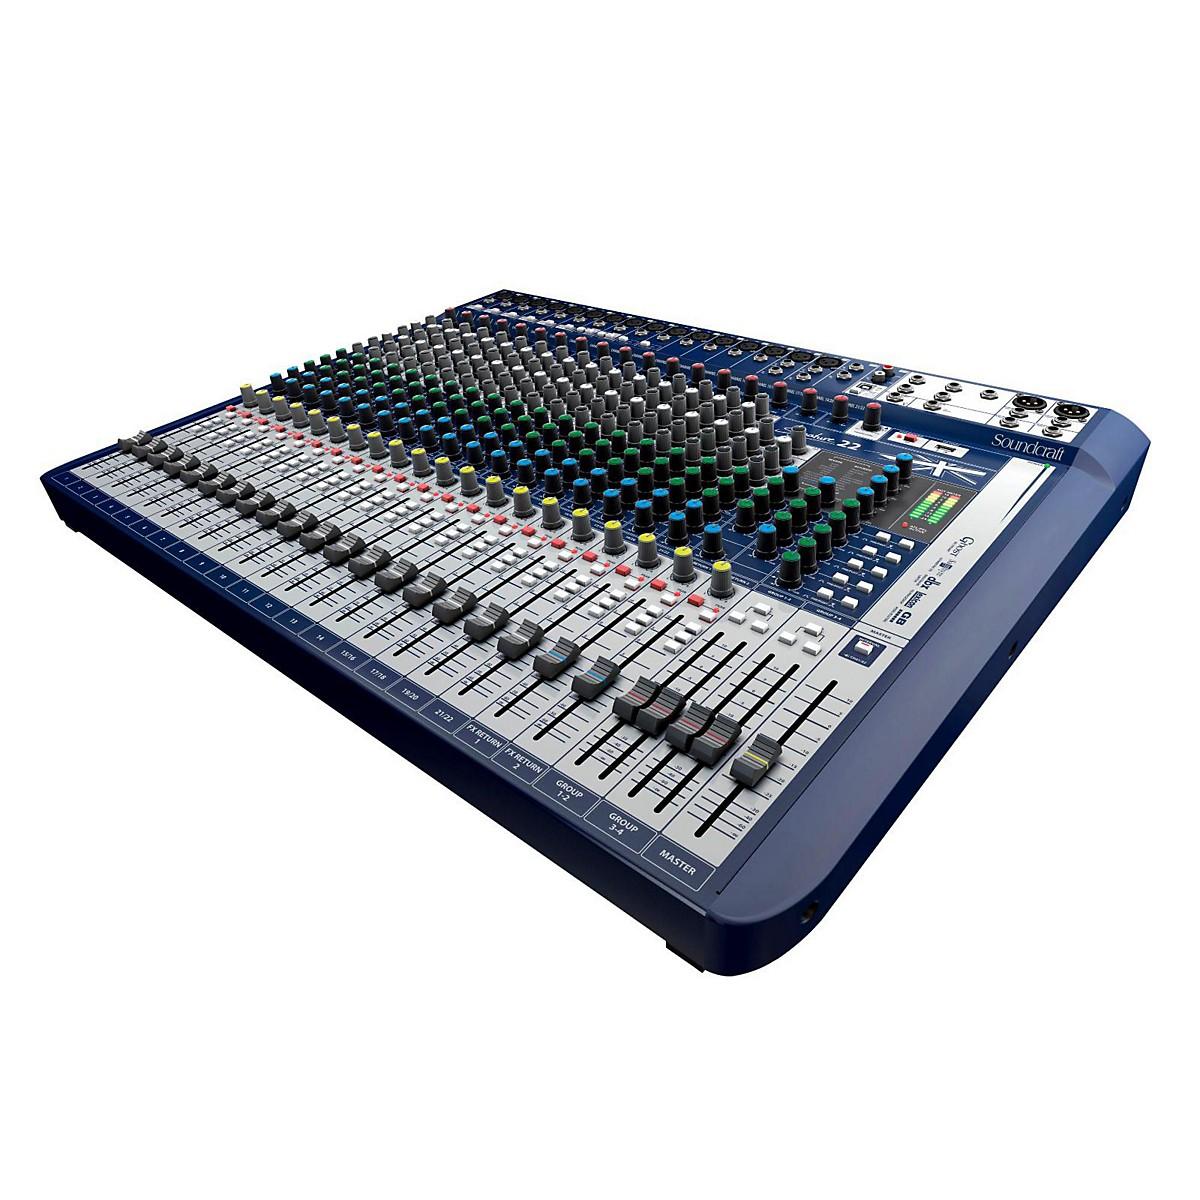 Soundcraft Signature 22 22-Input Analog Mixer with Effects